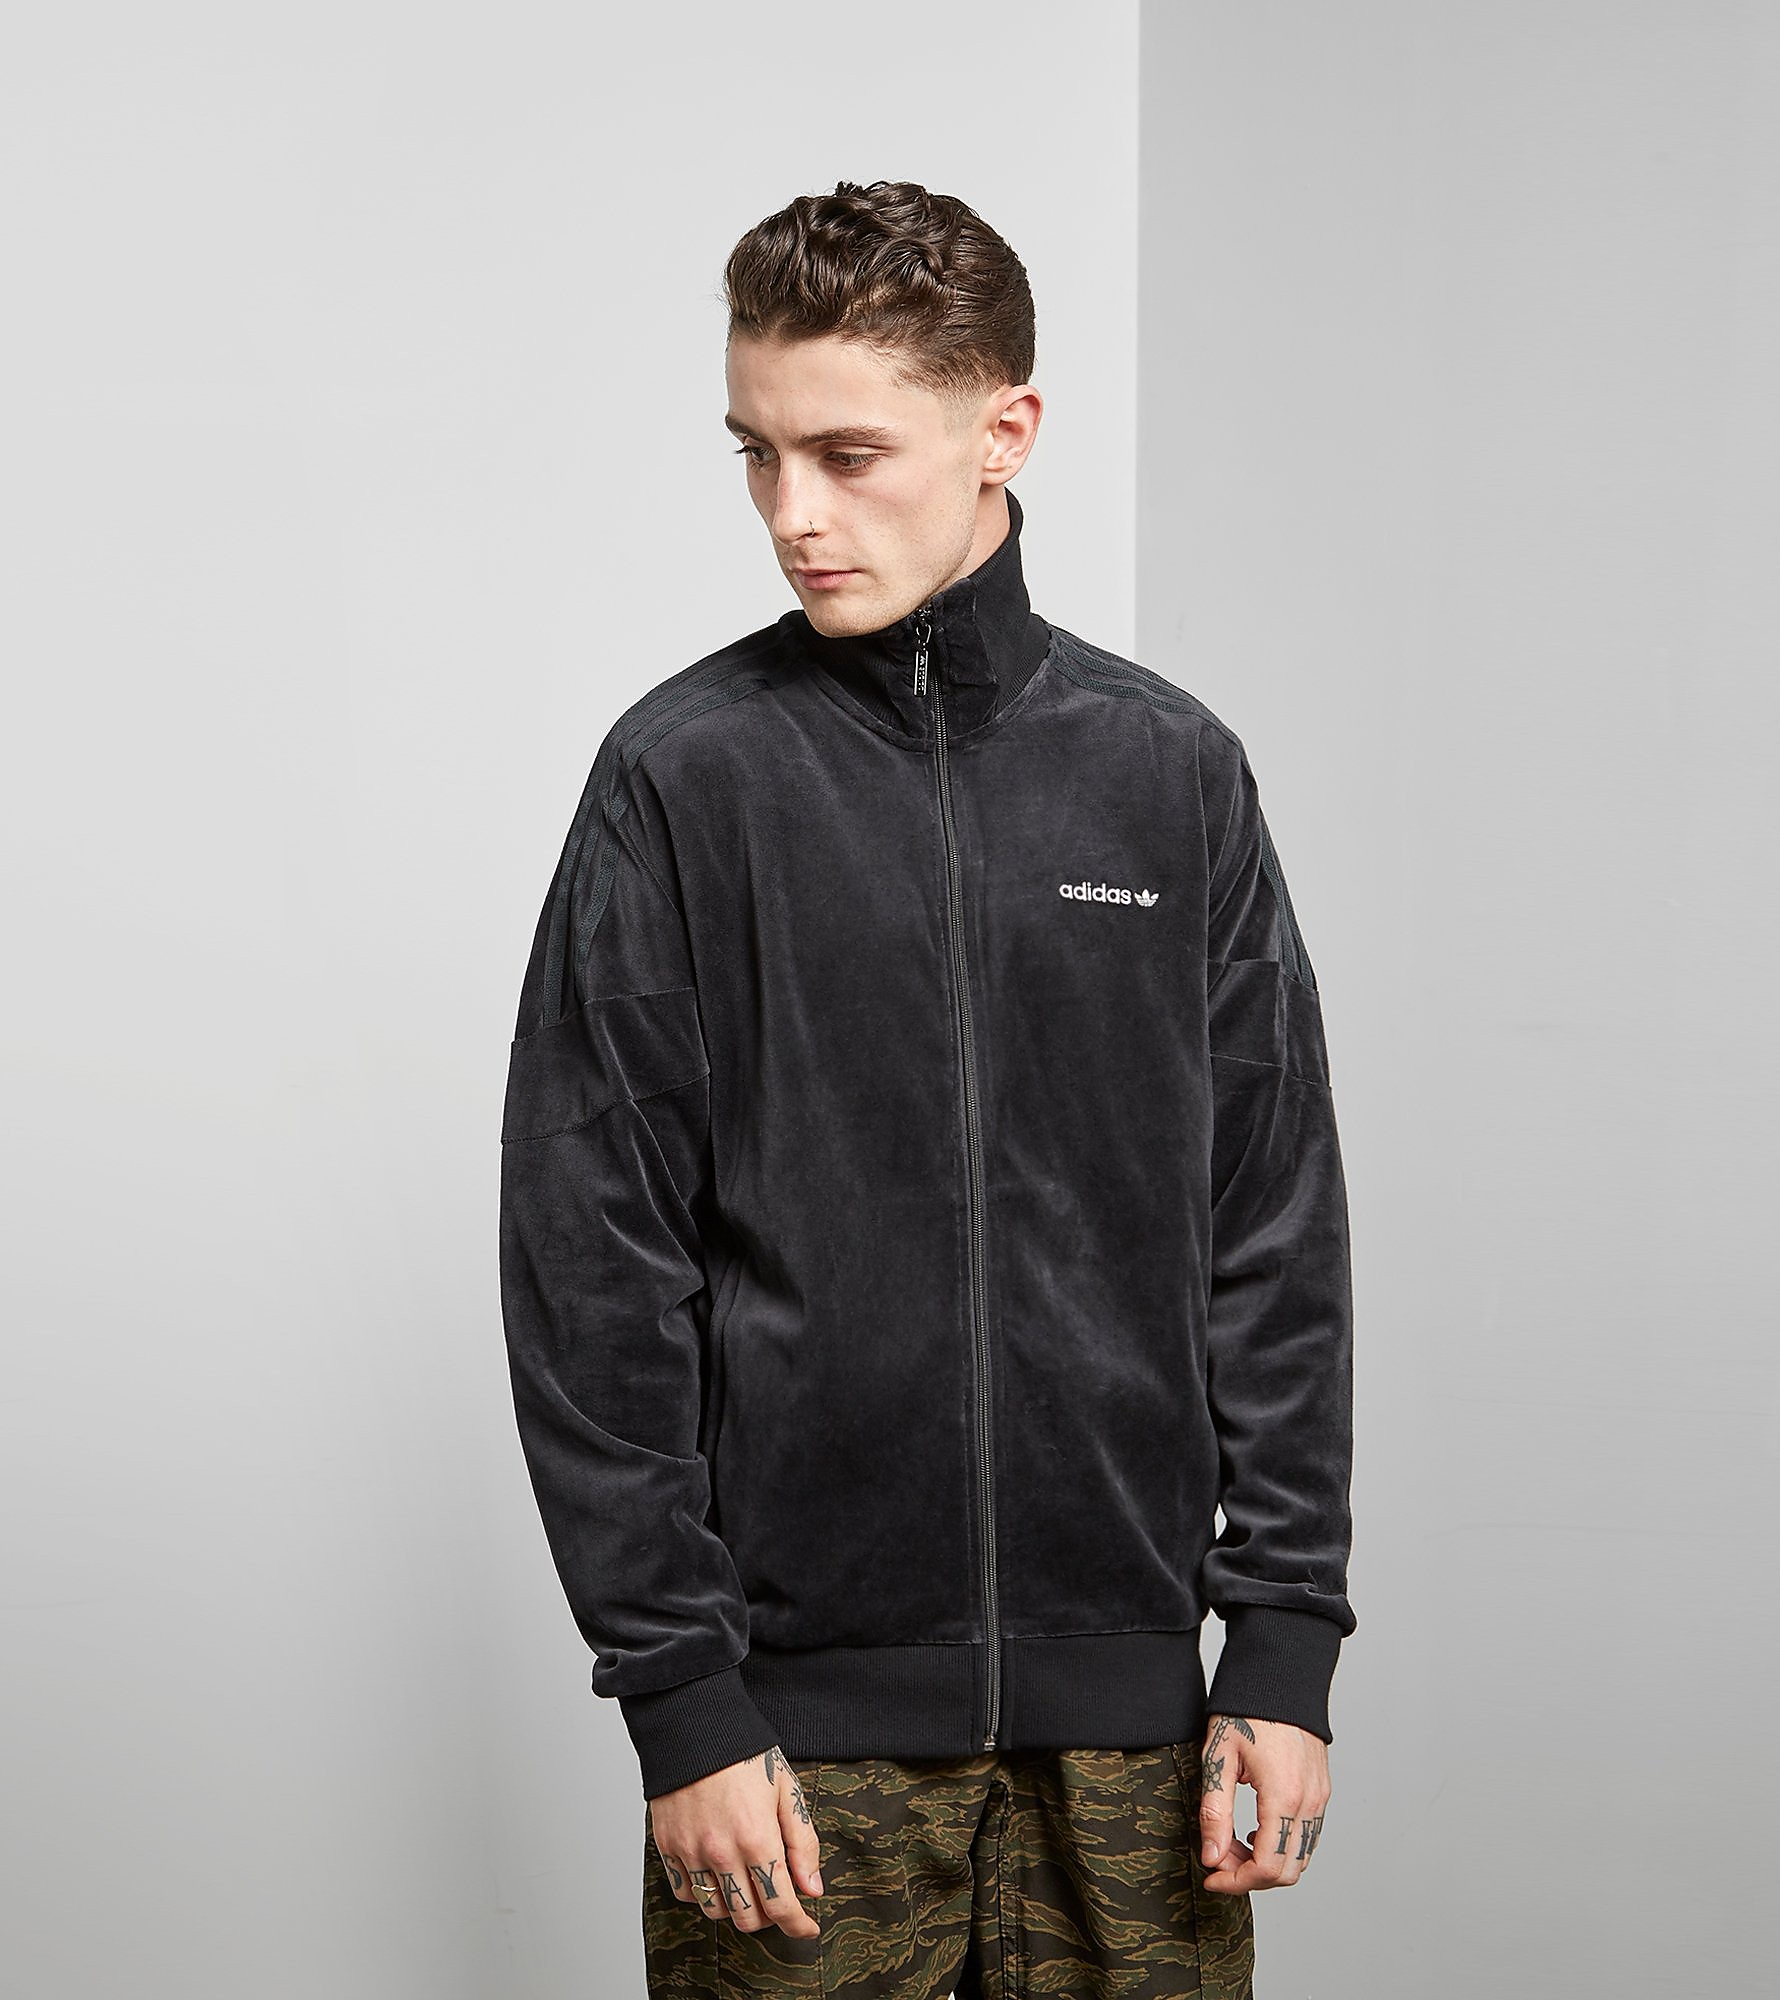 adidas Originals Velour Track Jacket